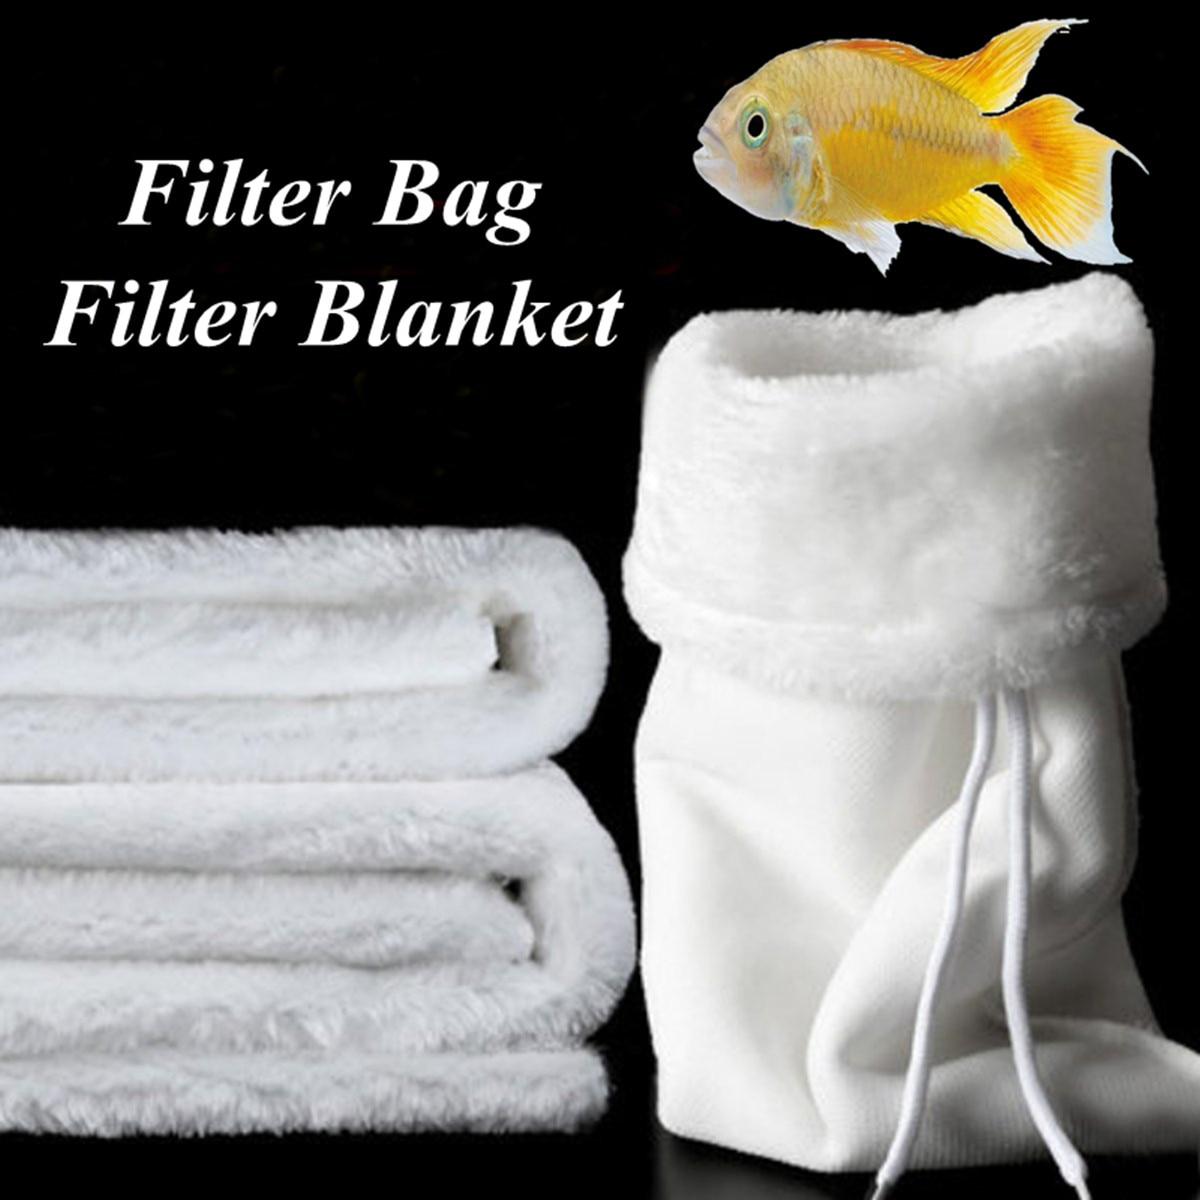 New Polyester Fish Tank Aquarium Marine Sump Felt Pre Dry Wet Separation Filter Sock Blanket Filter Bag Aquarium Filter Cotton Водоочистка